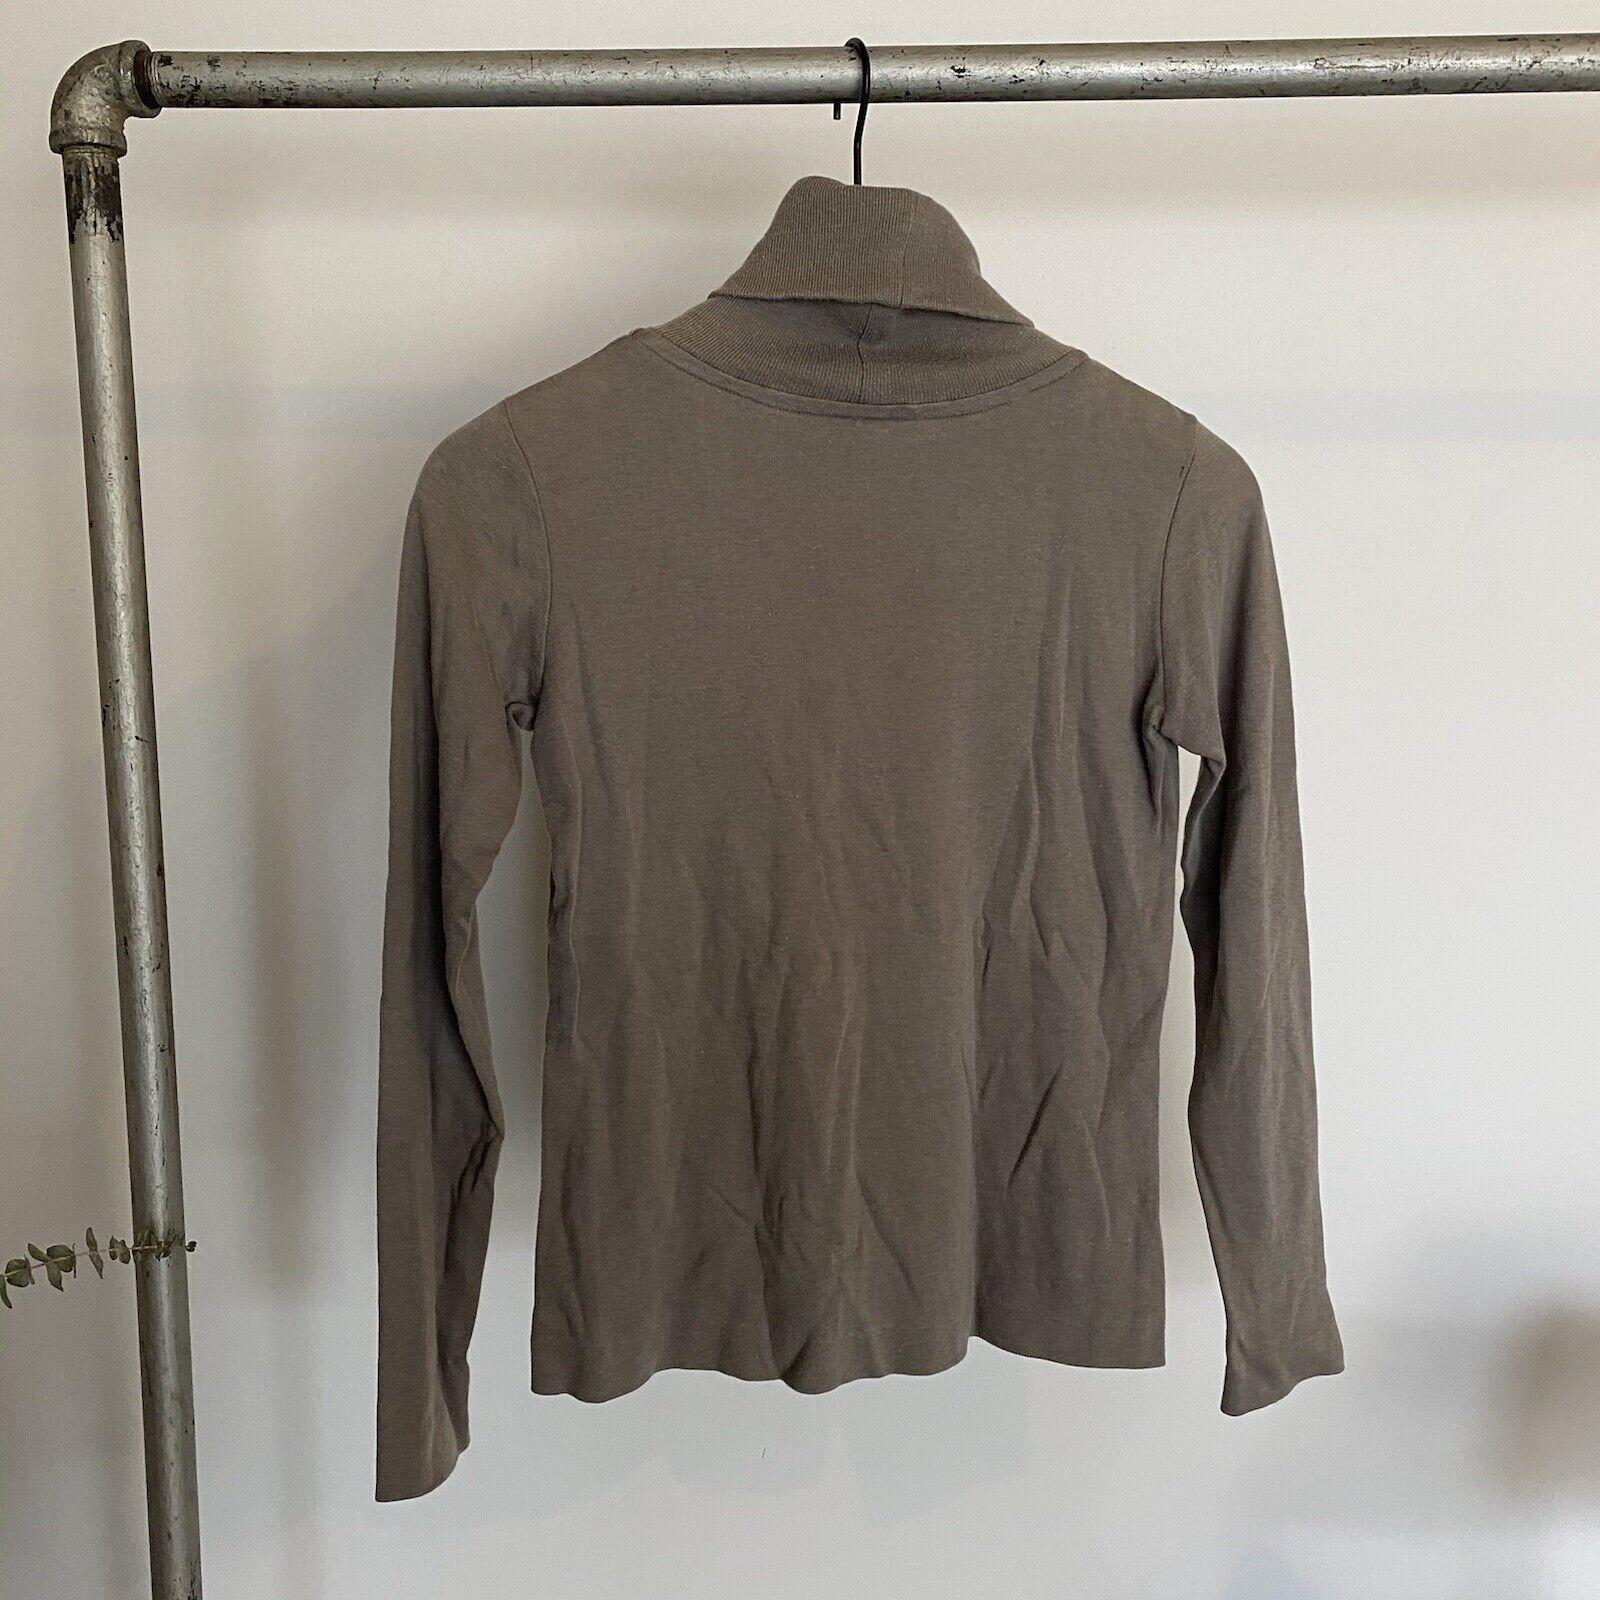 Vtg 80s 90s Ralph Lauren Turtleneck Sweater Cente… - image 5